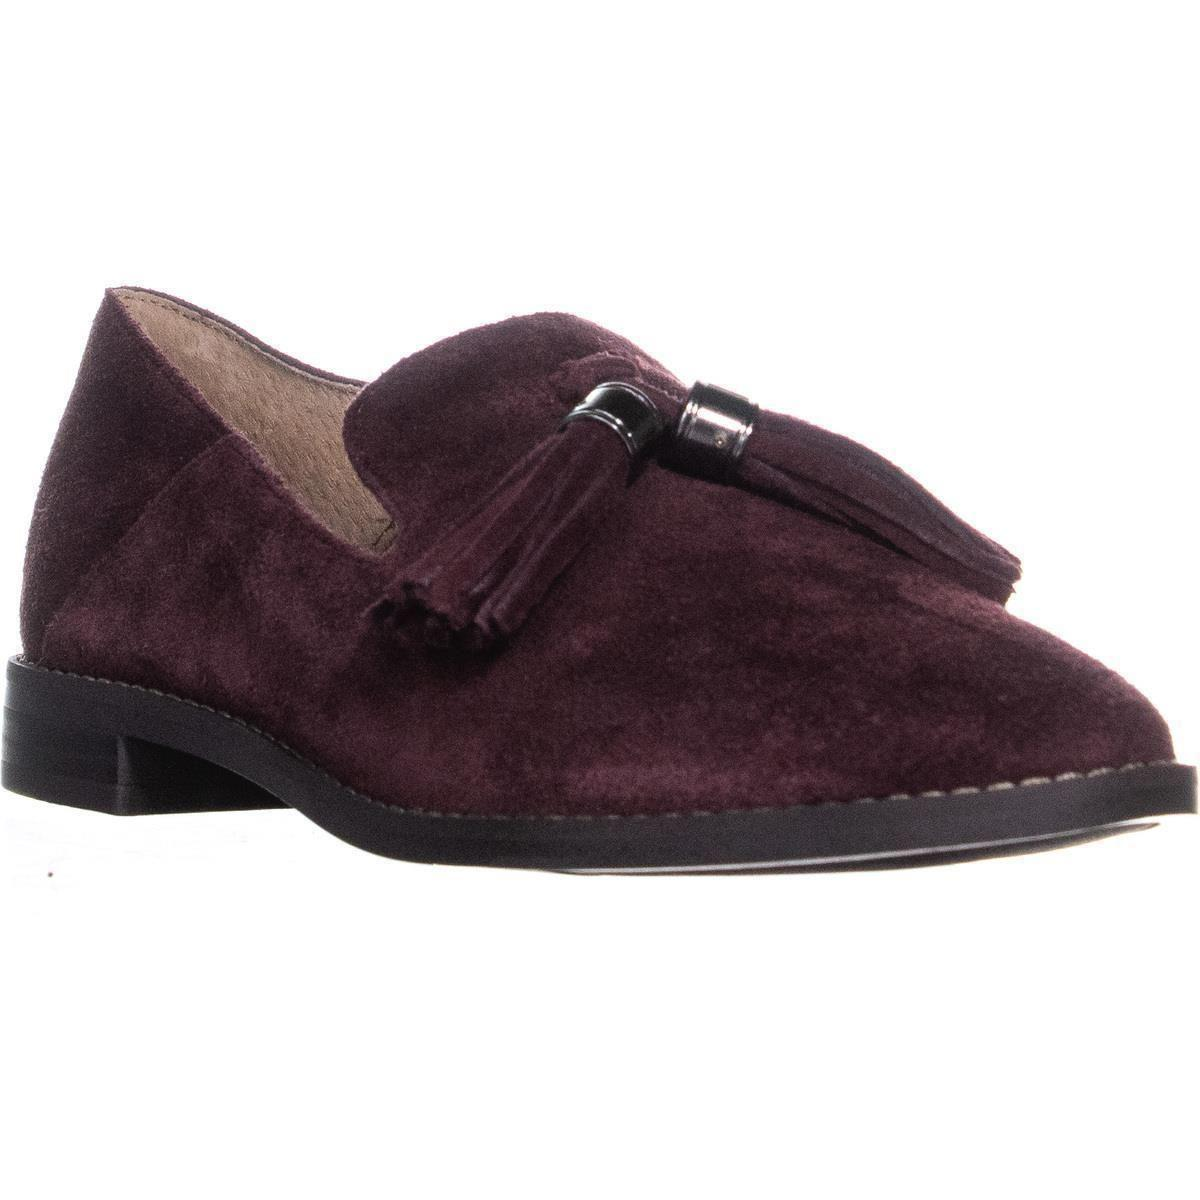 3869b413558 Lyst - Franco Sarto Hadden Flat Loafers